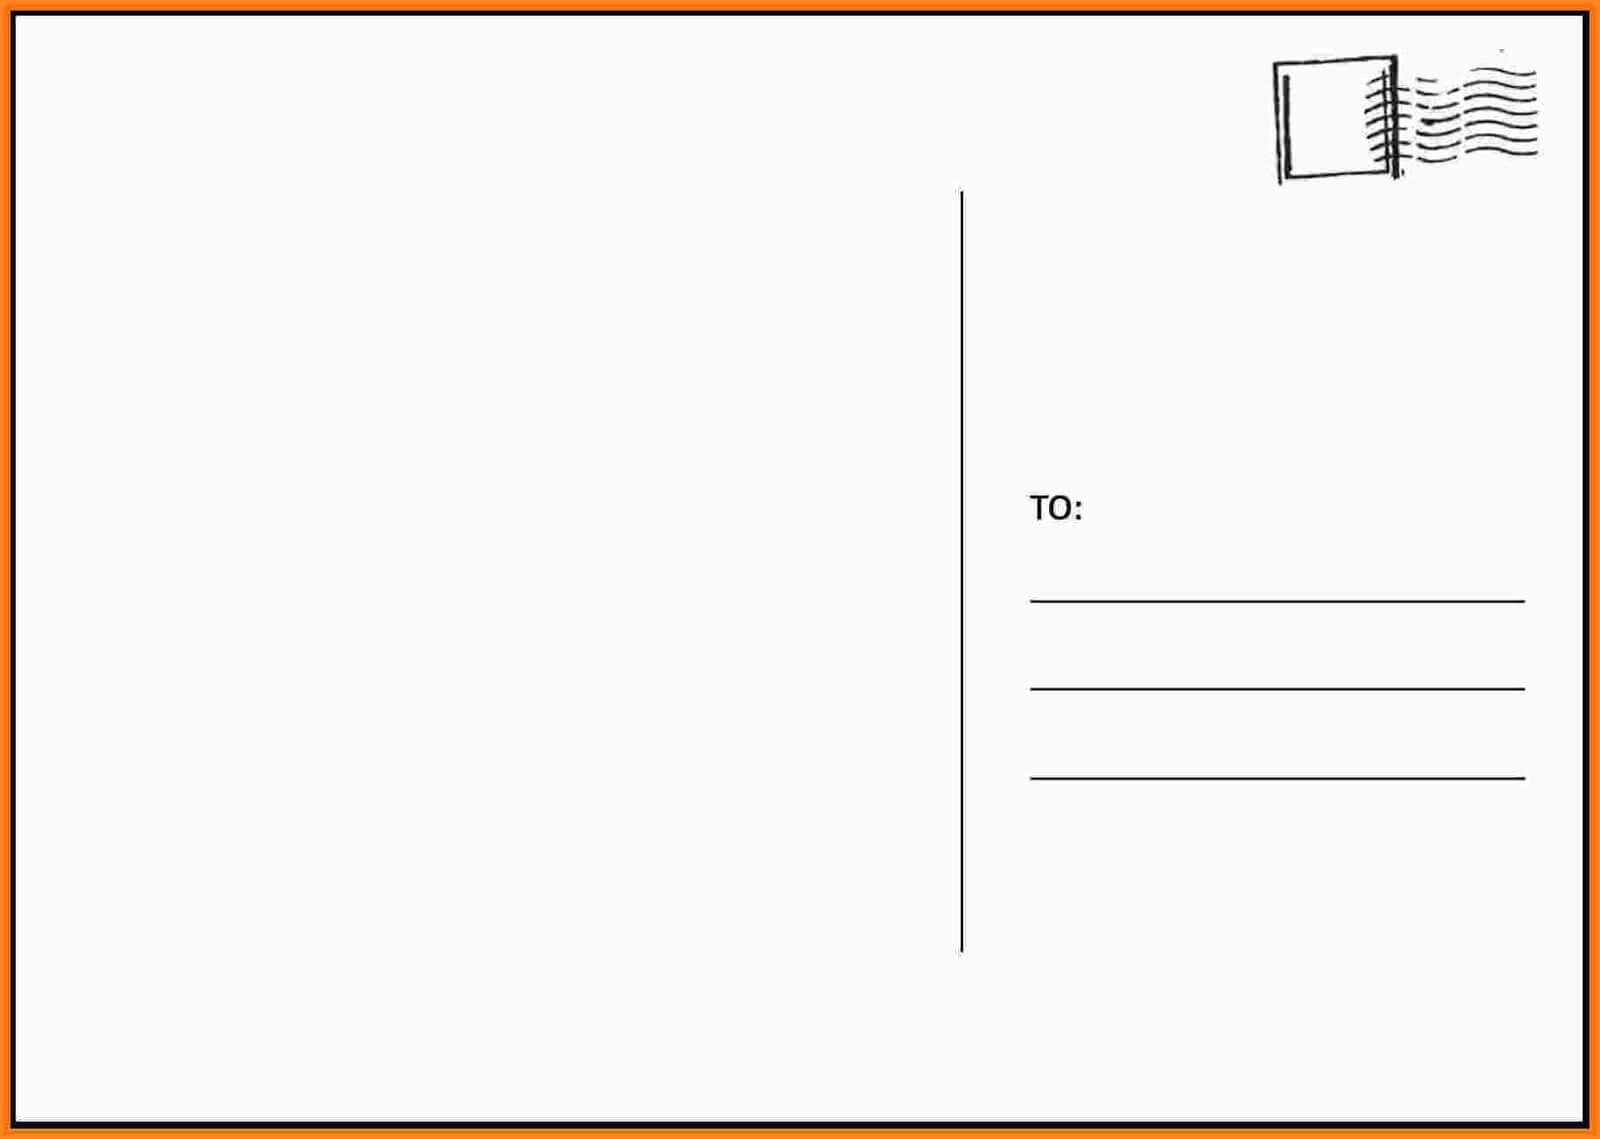 008 Free2Bprintable2Bpostcard2Btemplates2Bfree Blank Inside Free Blank Postcard Template For Word